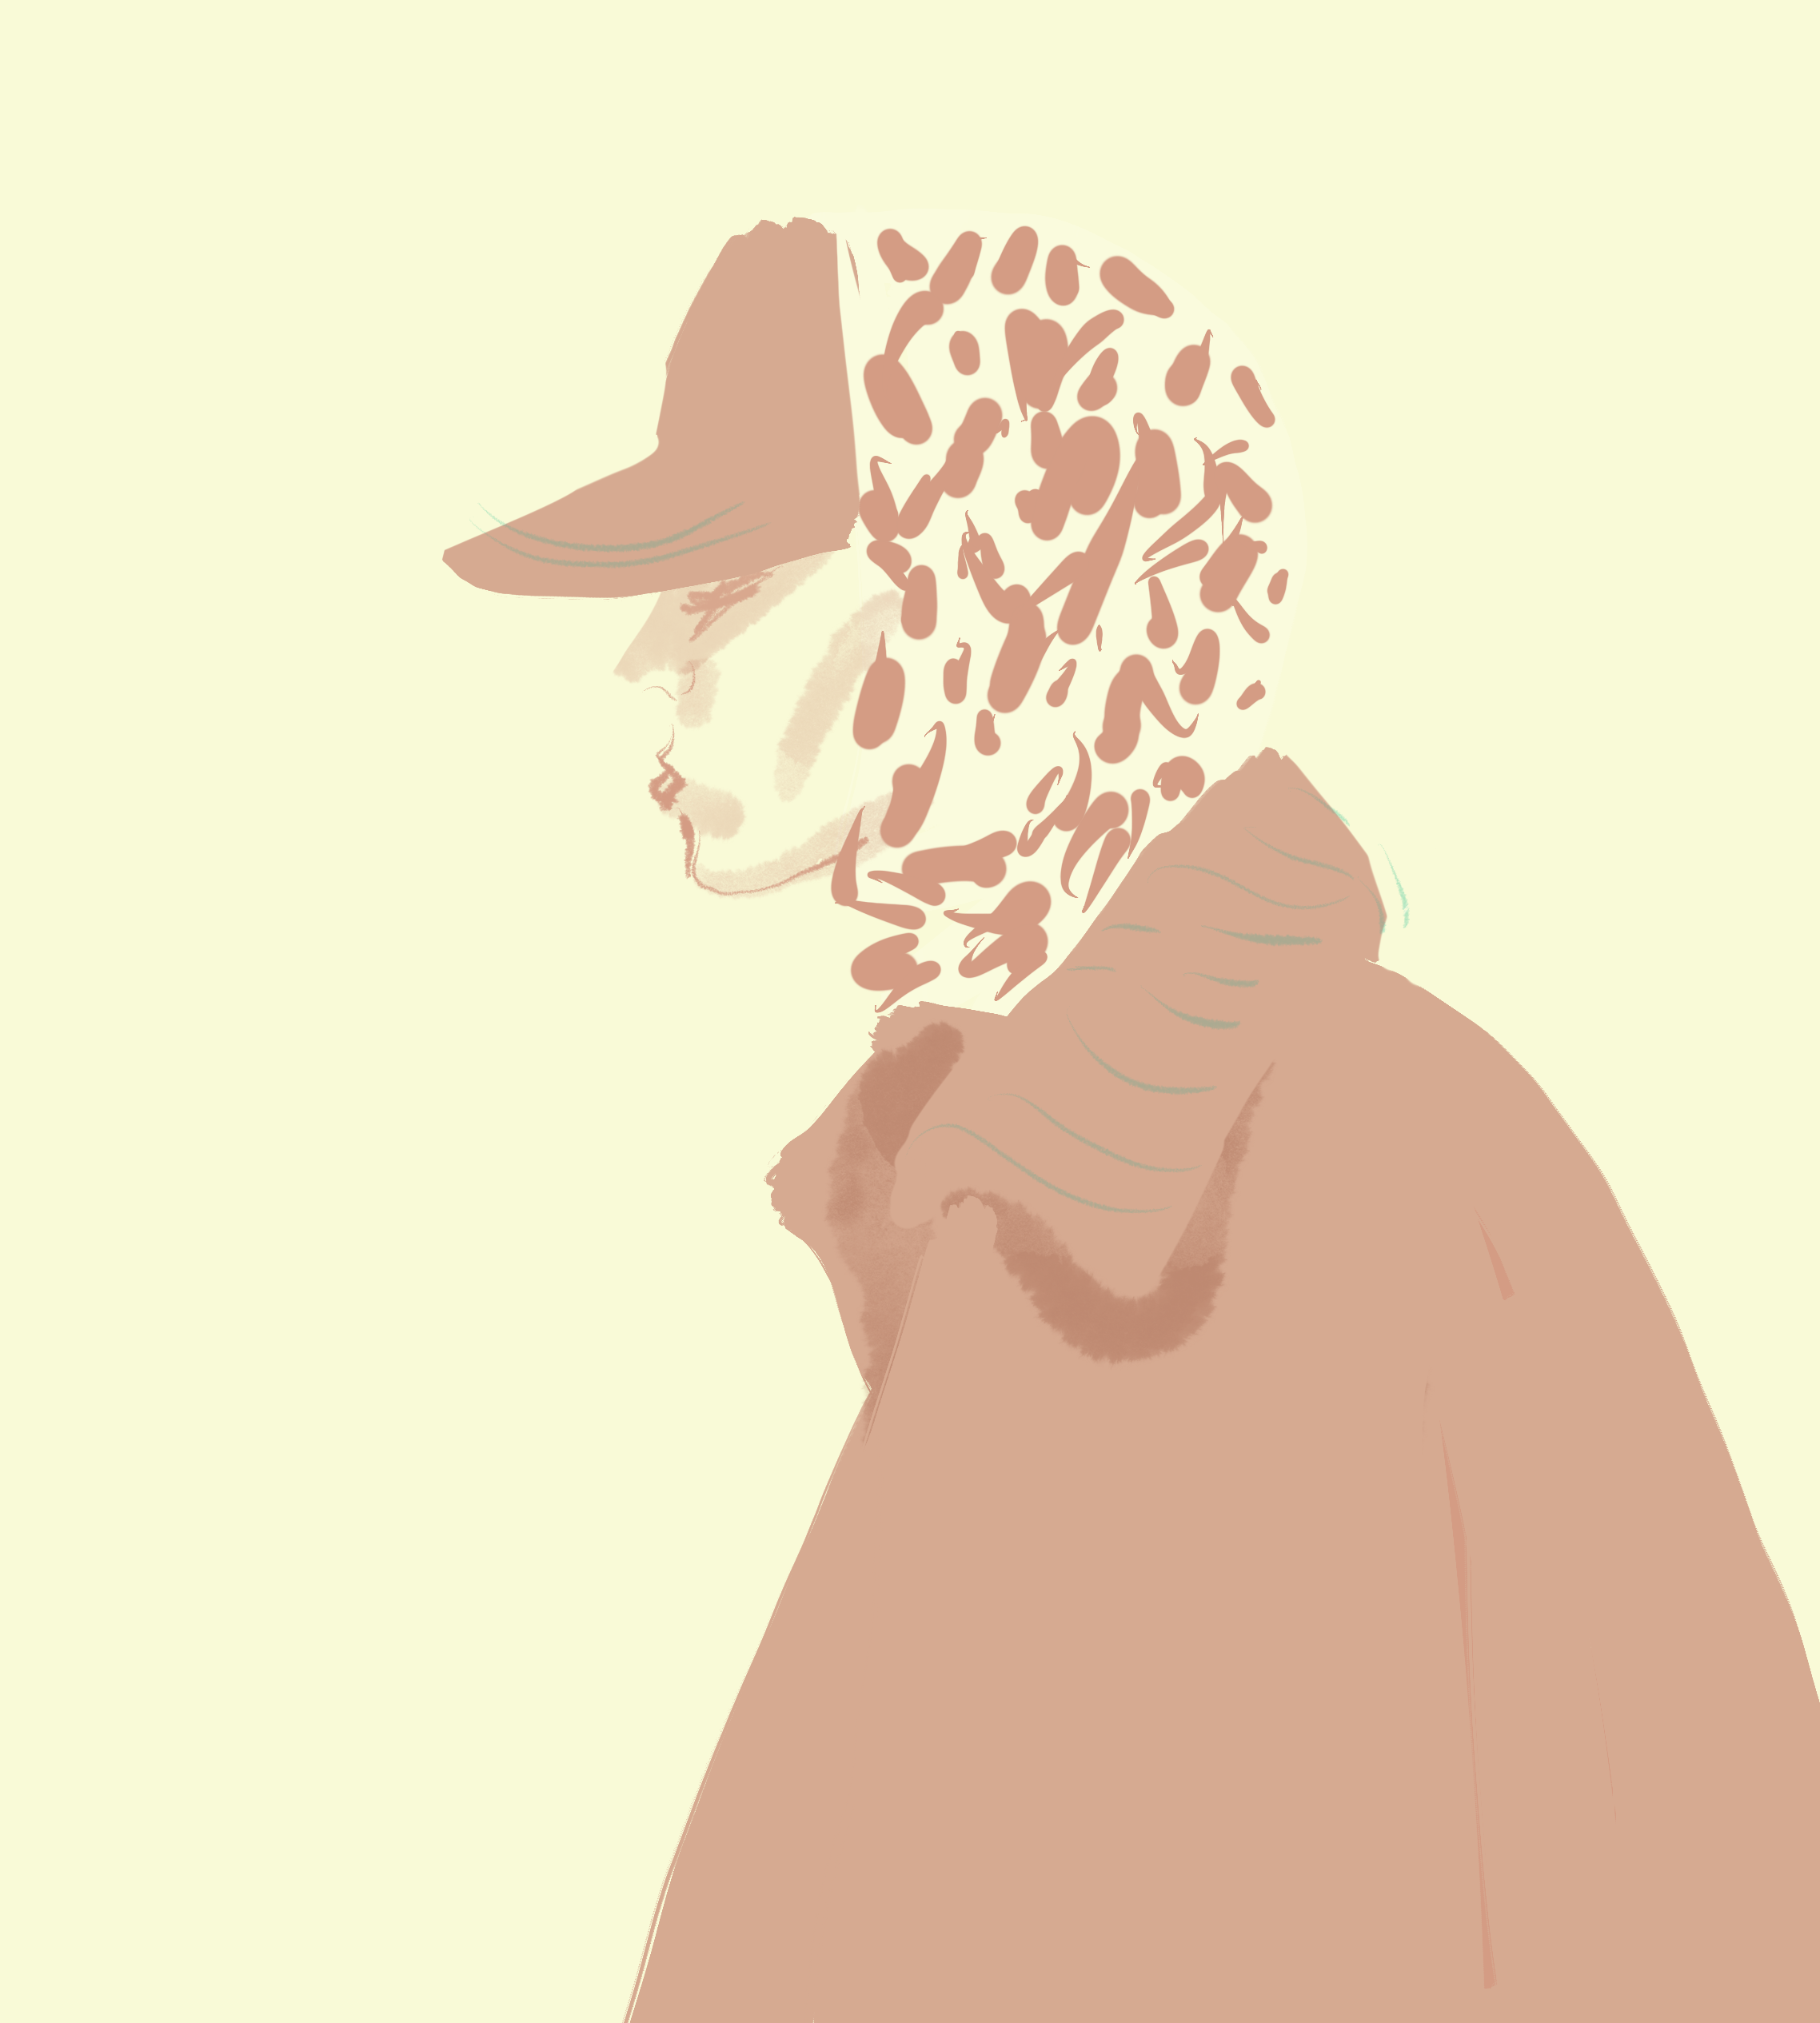 Cap, fashion illustration by Silvana Mariani